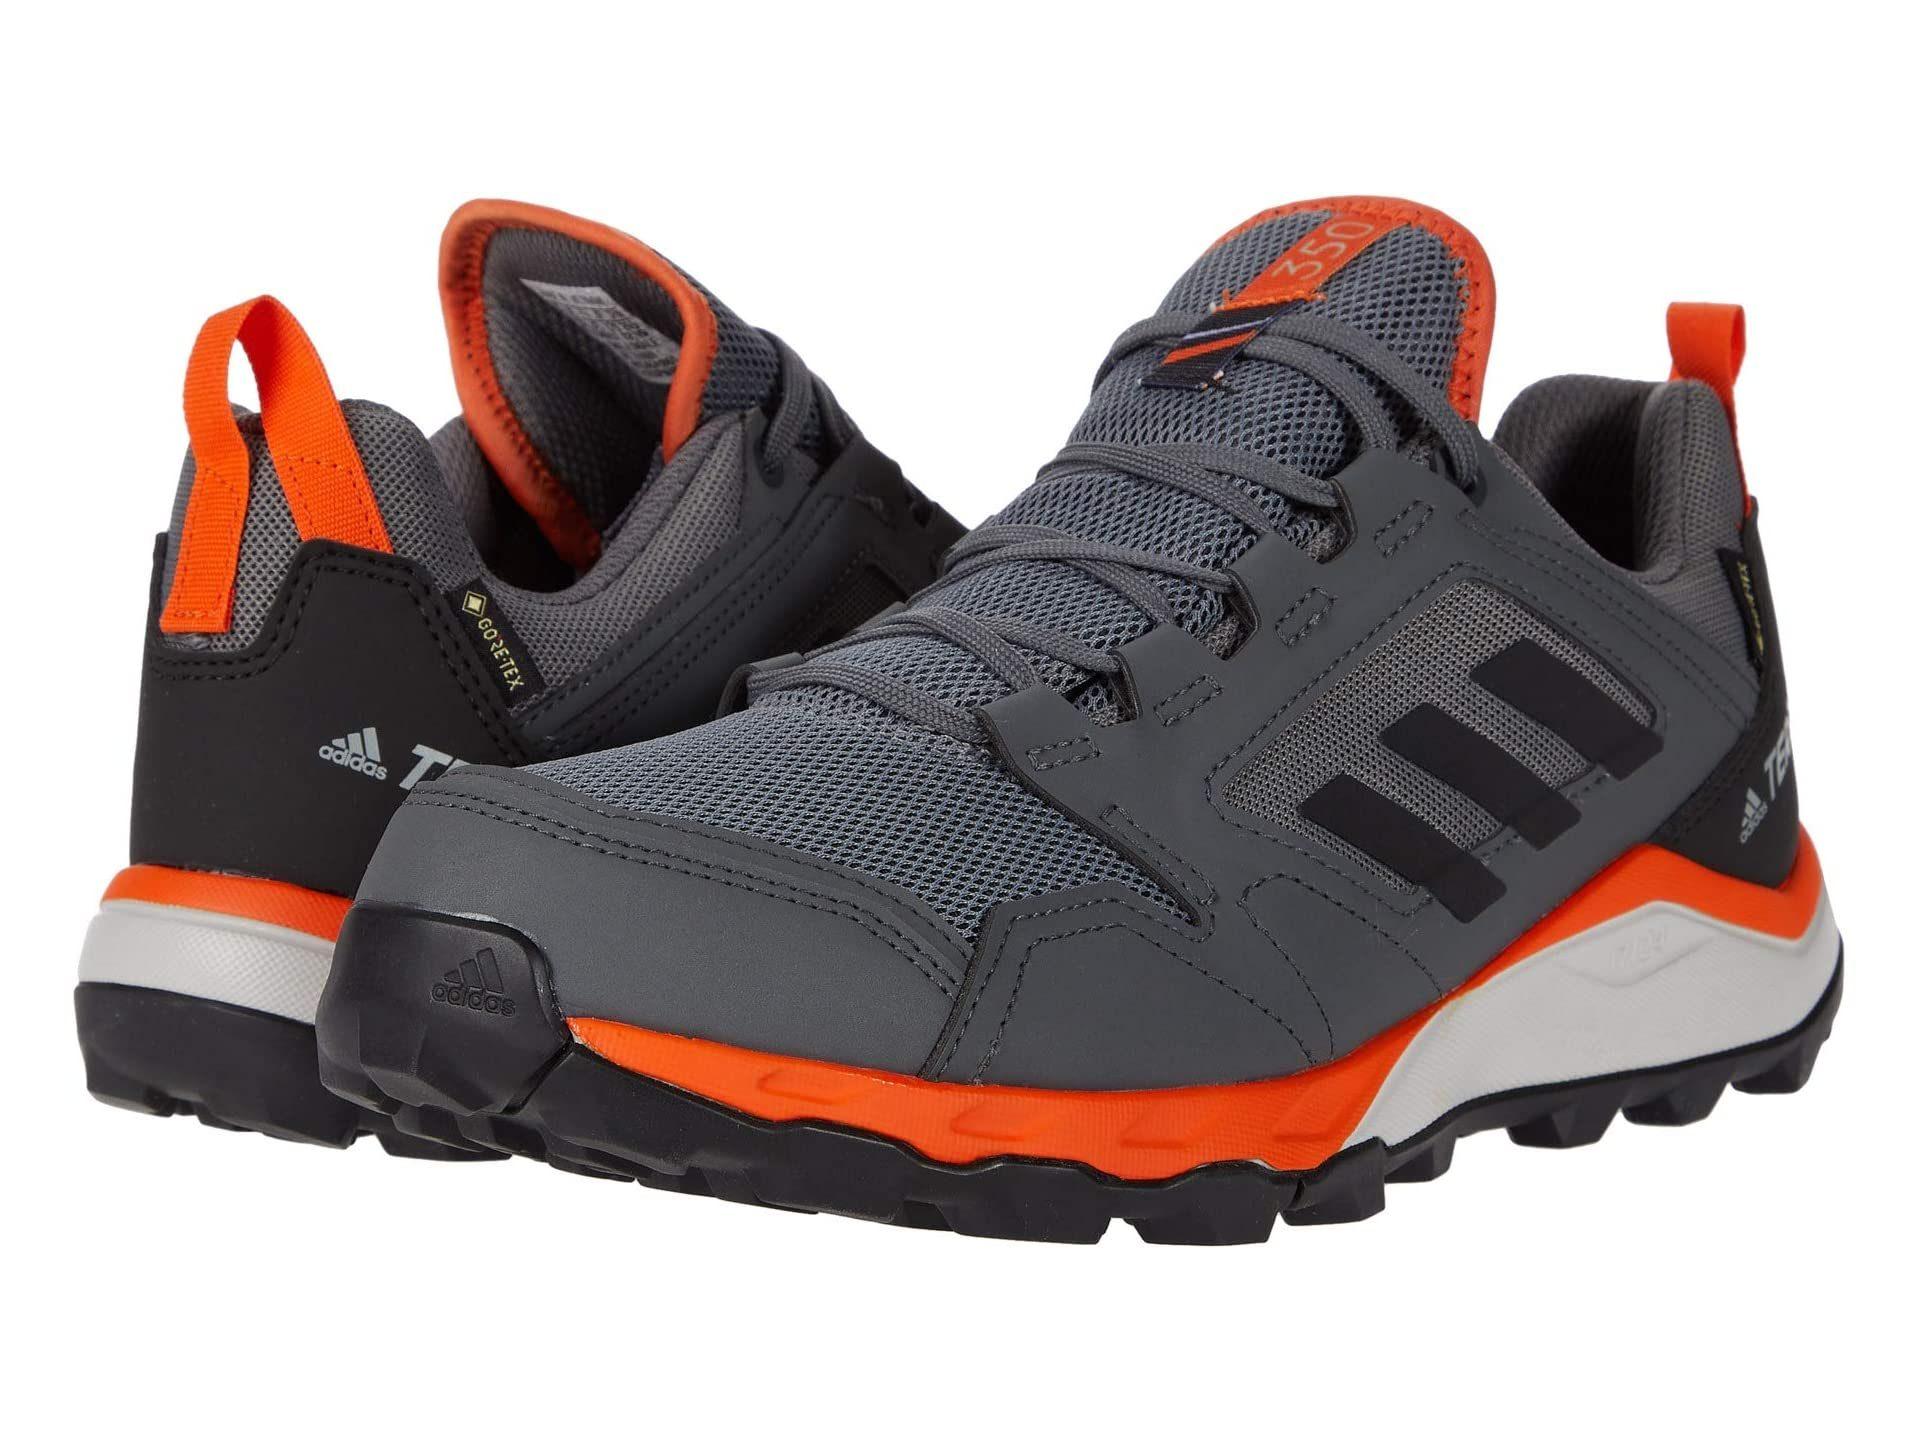 adidas Outdoor Terrex Agravic TR GTX outdoor shoe